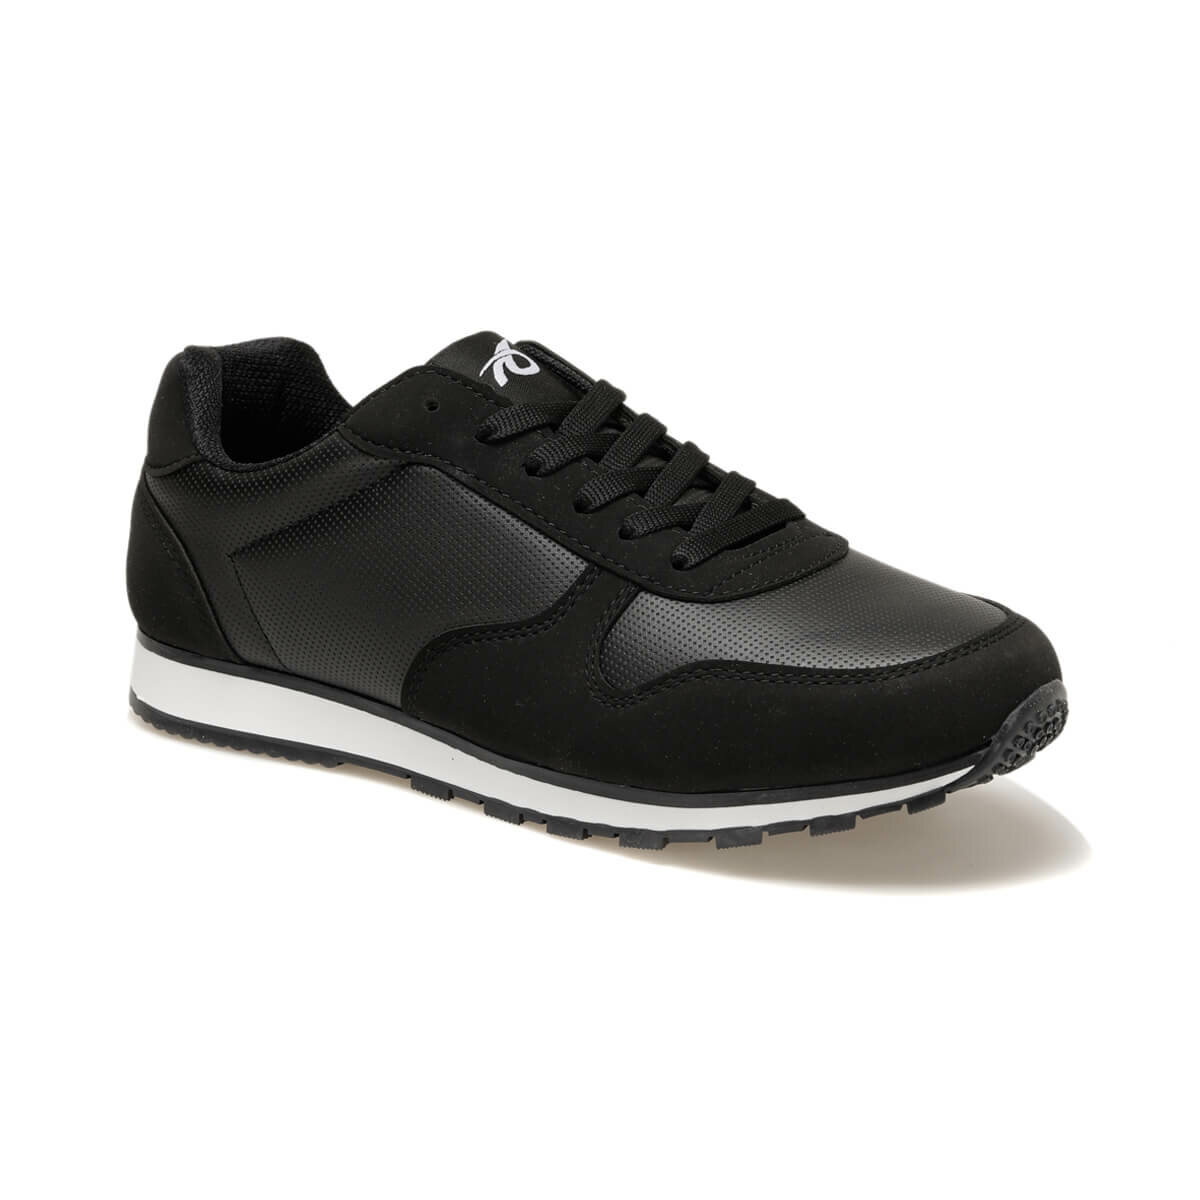 FLO DAILY Black Men 'S Sneaker Shoes Torex